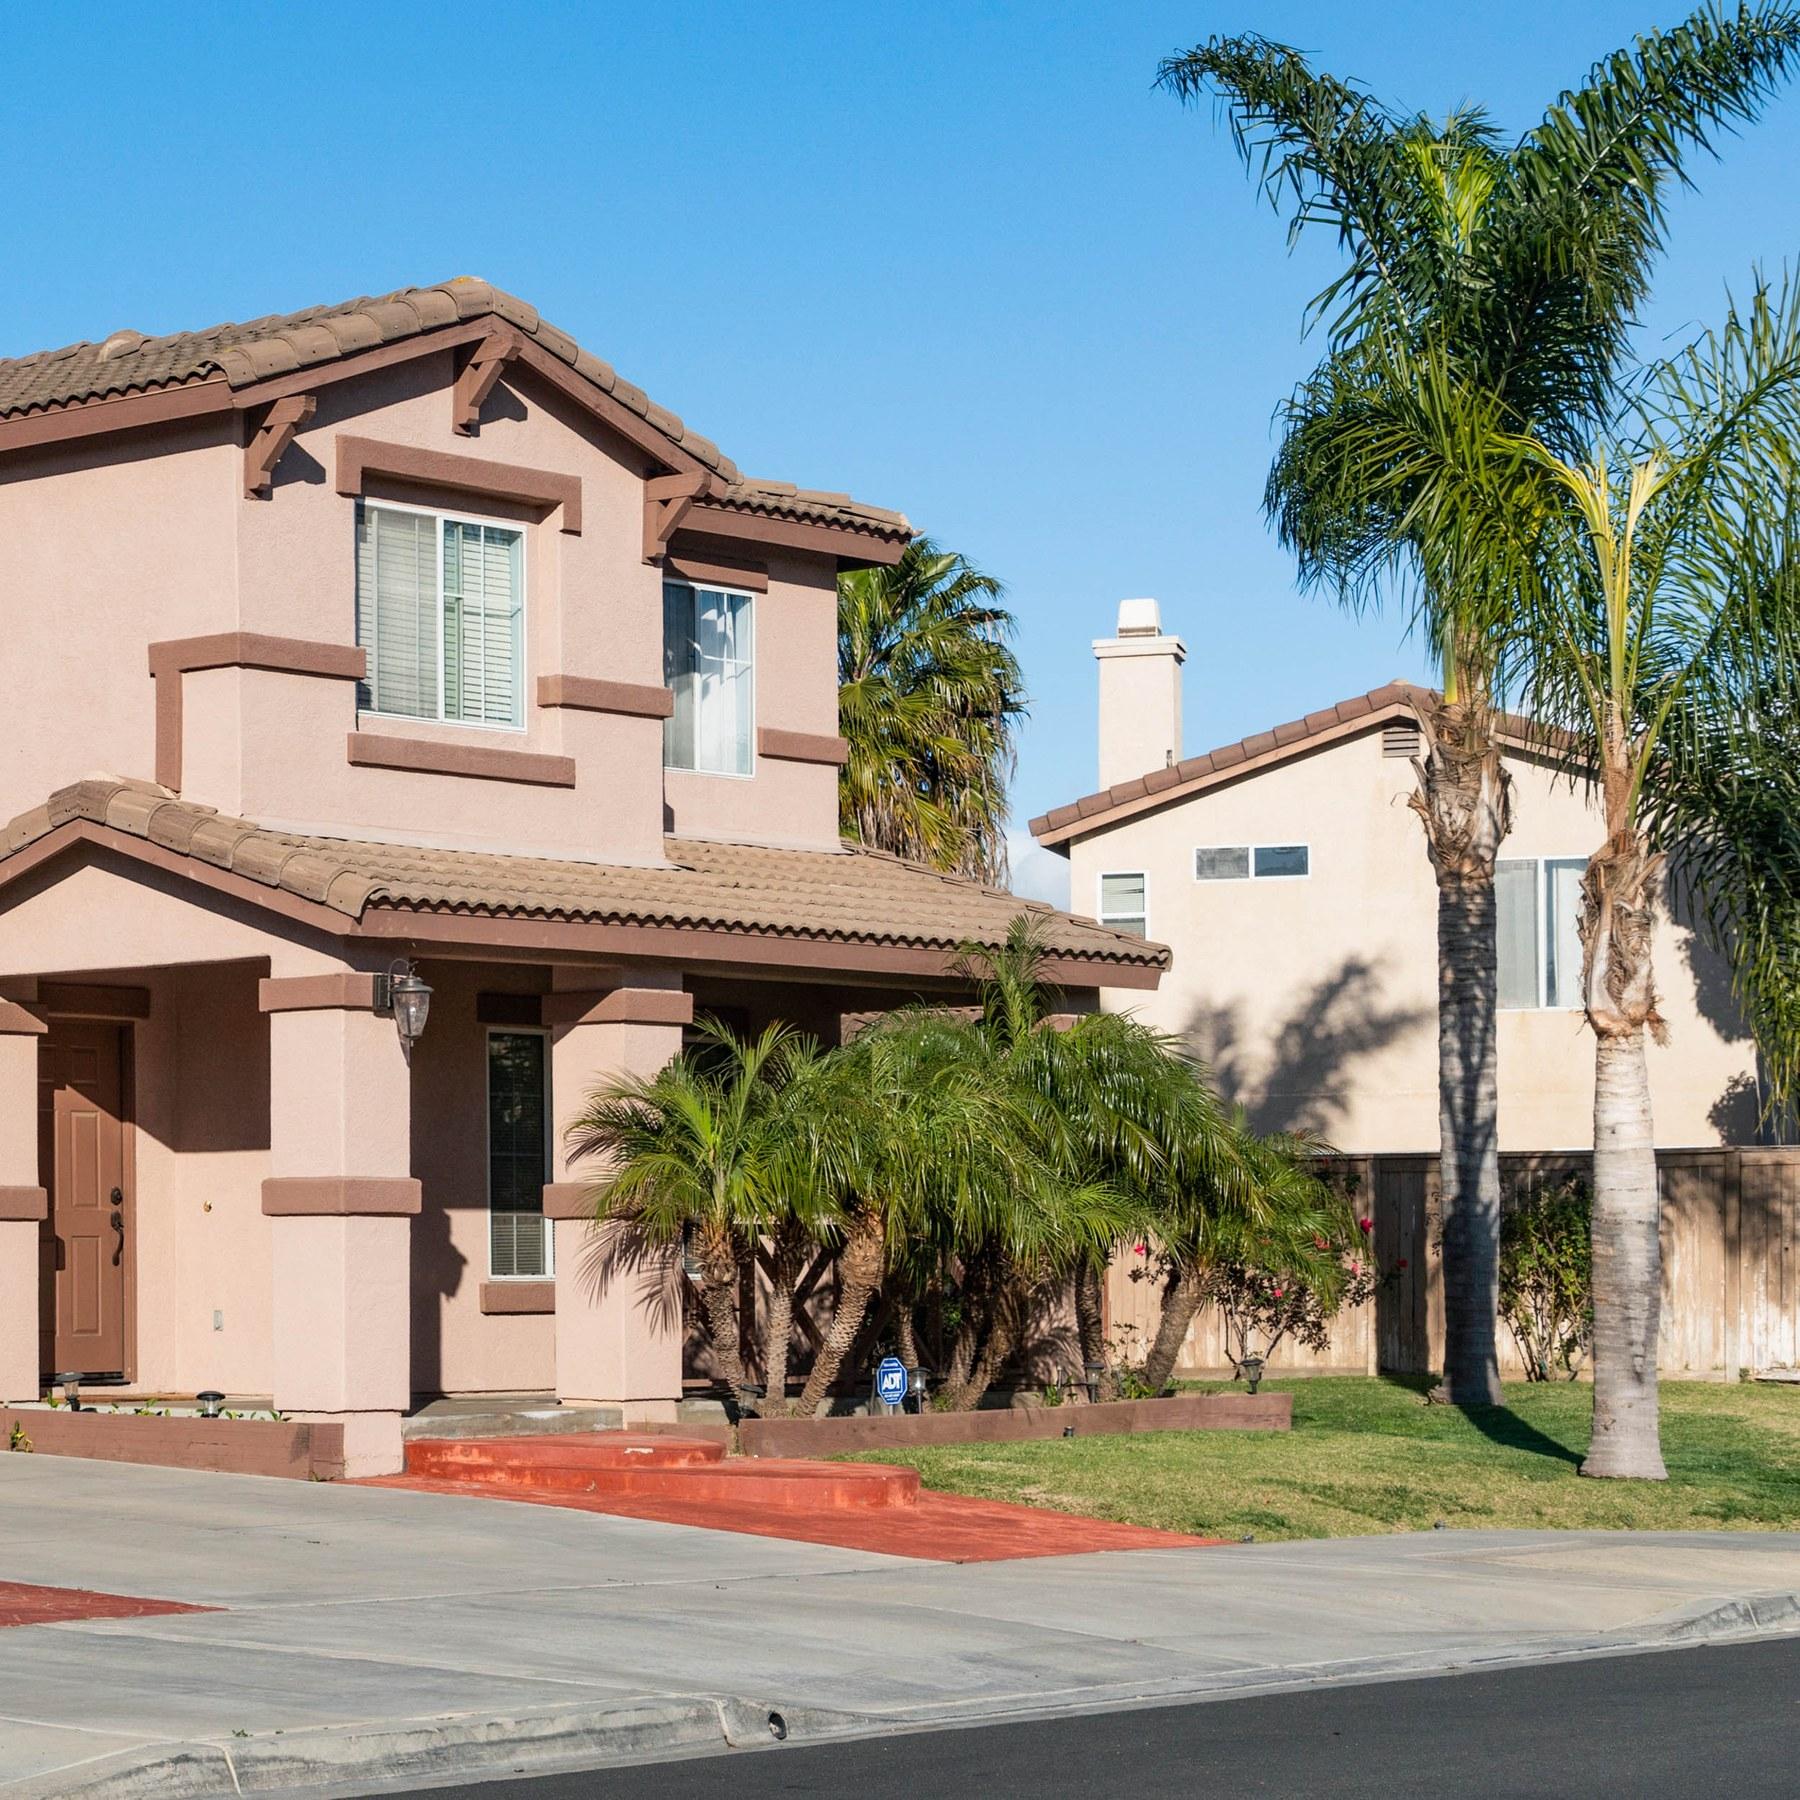 San Diego Apartments For Sale: San Ysidro, San Diego CA - Neighborhood Guide